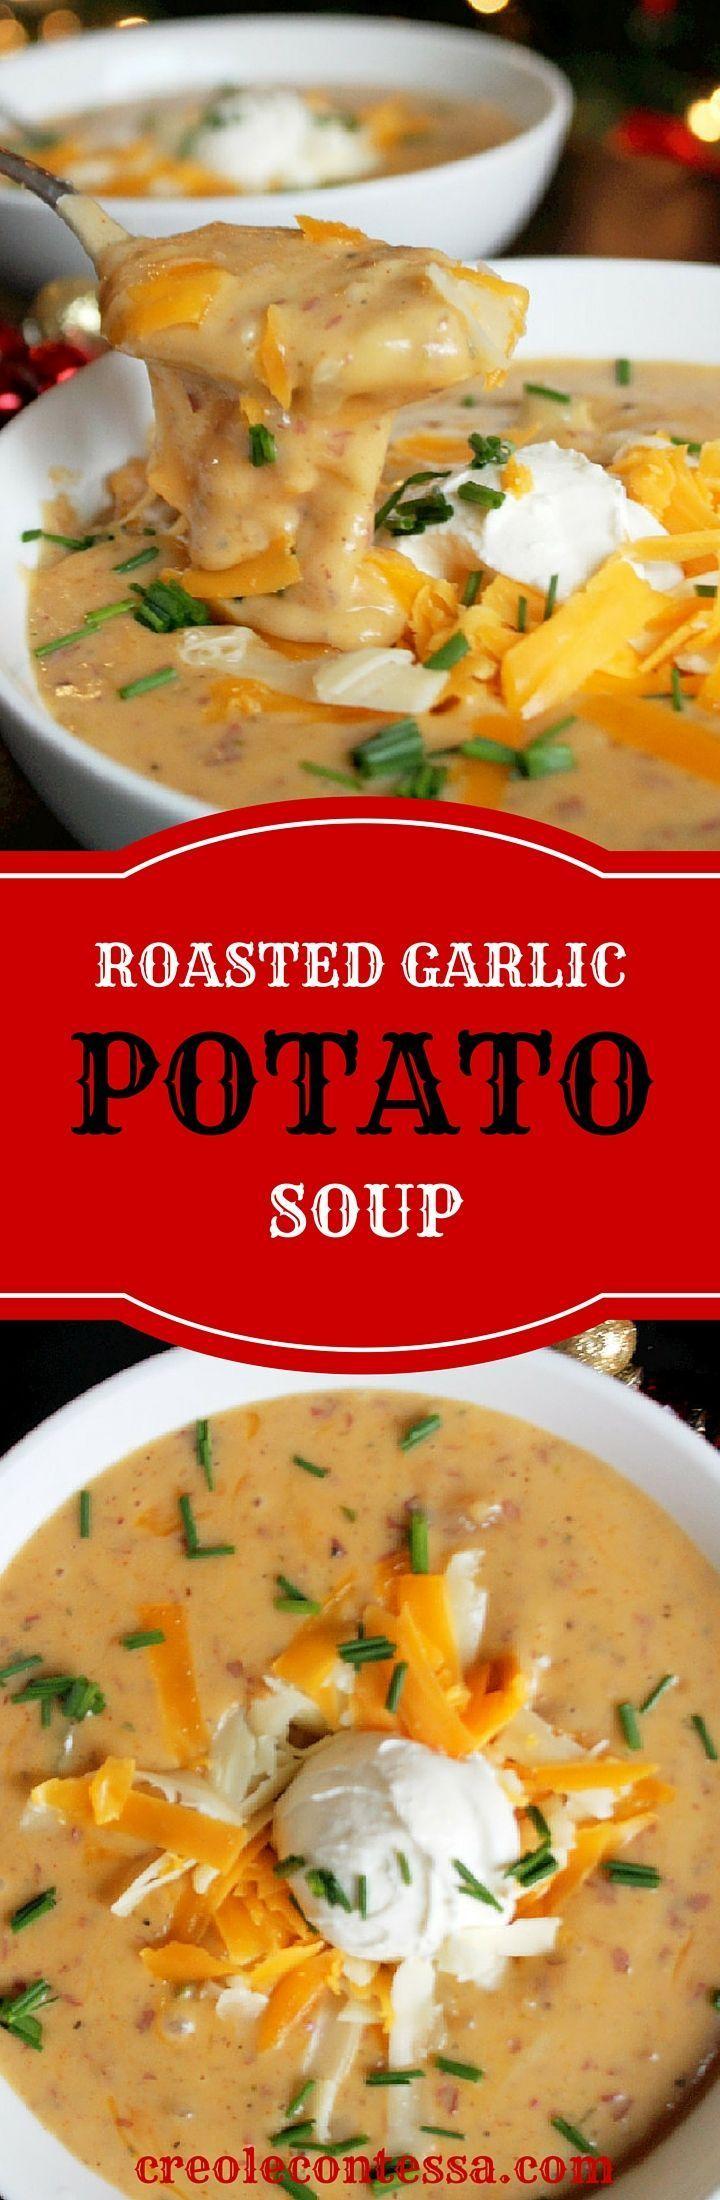 Slow Cooker Roasted Garlic Baked Potato Soup-Creole Contessa (garlic soup crockpot)